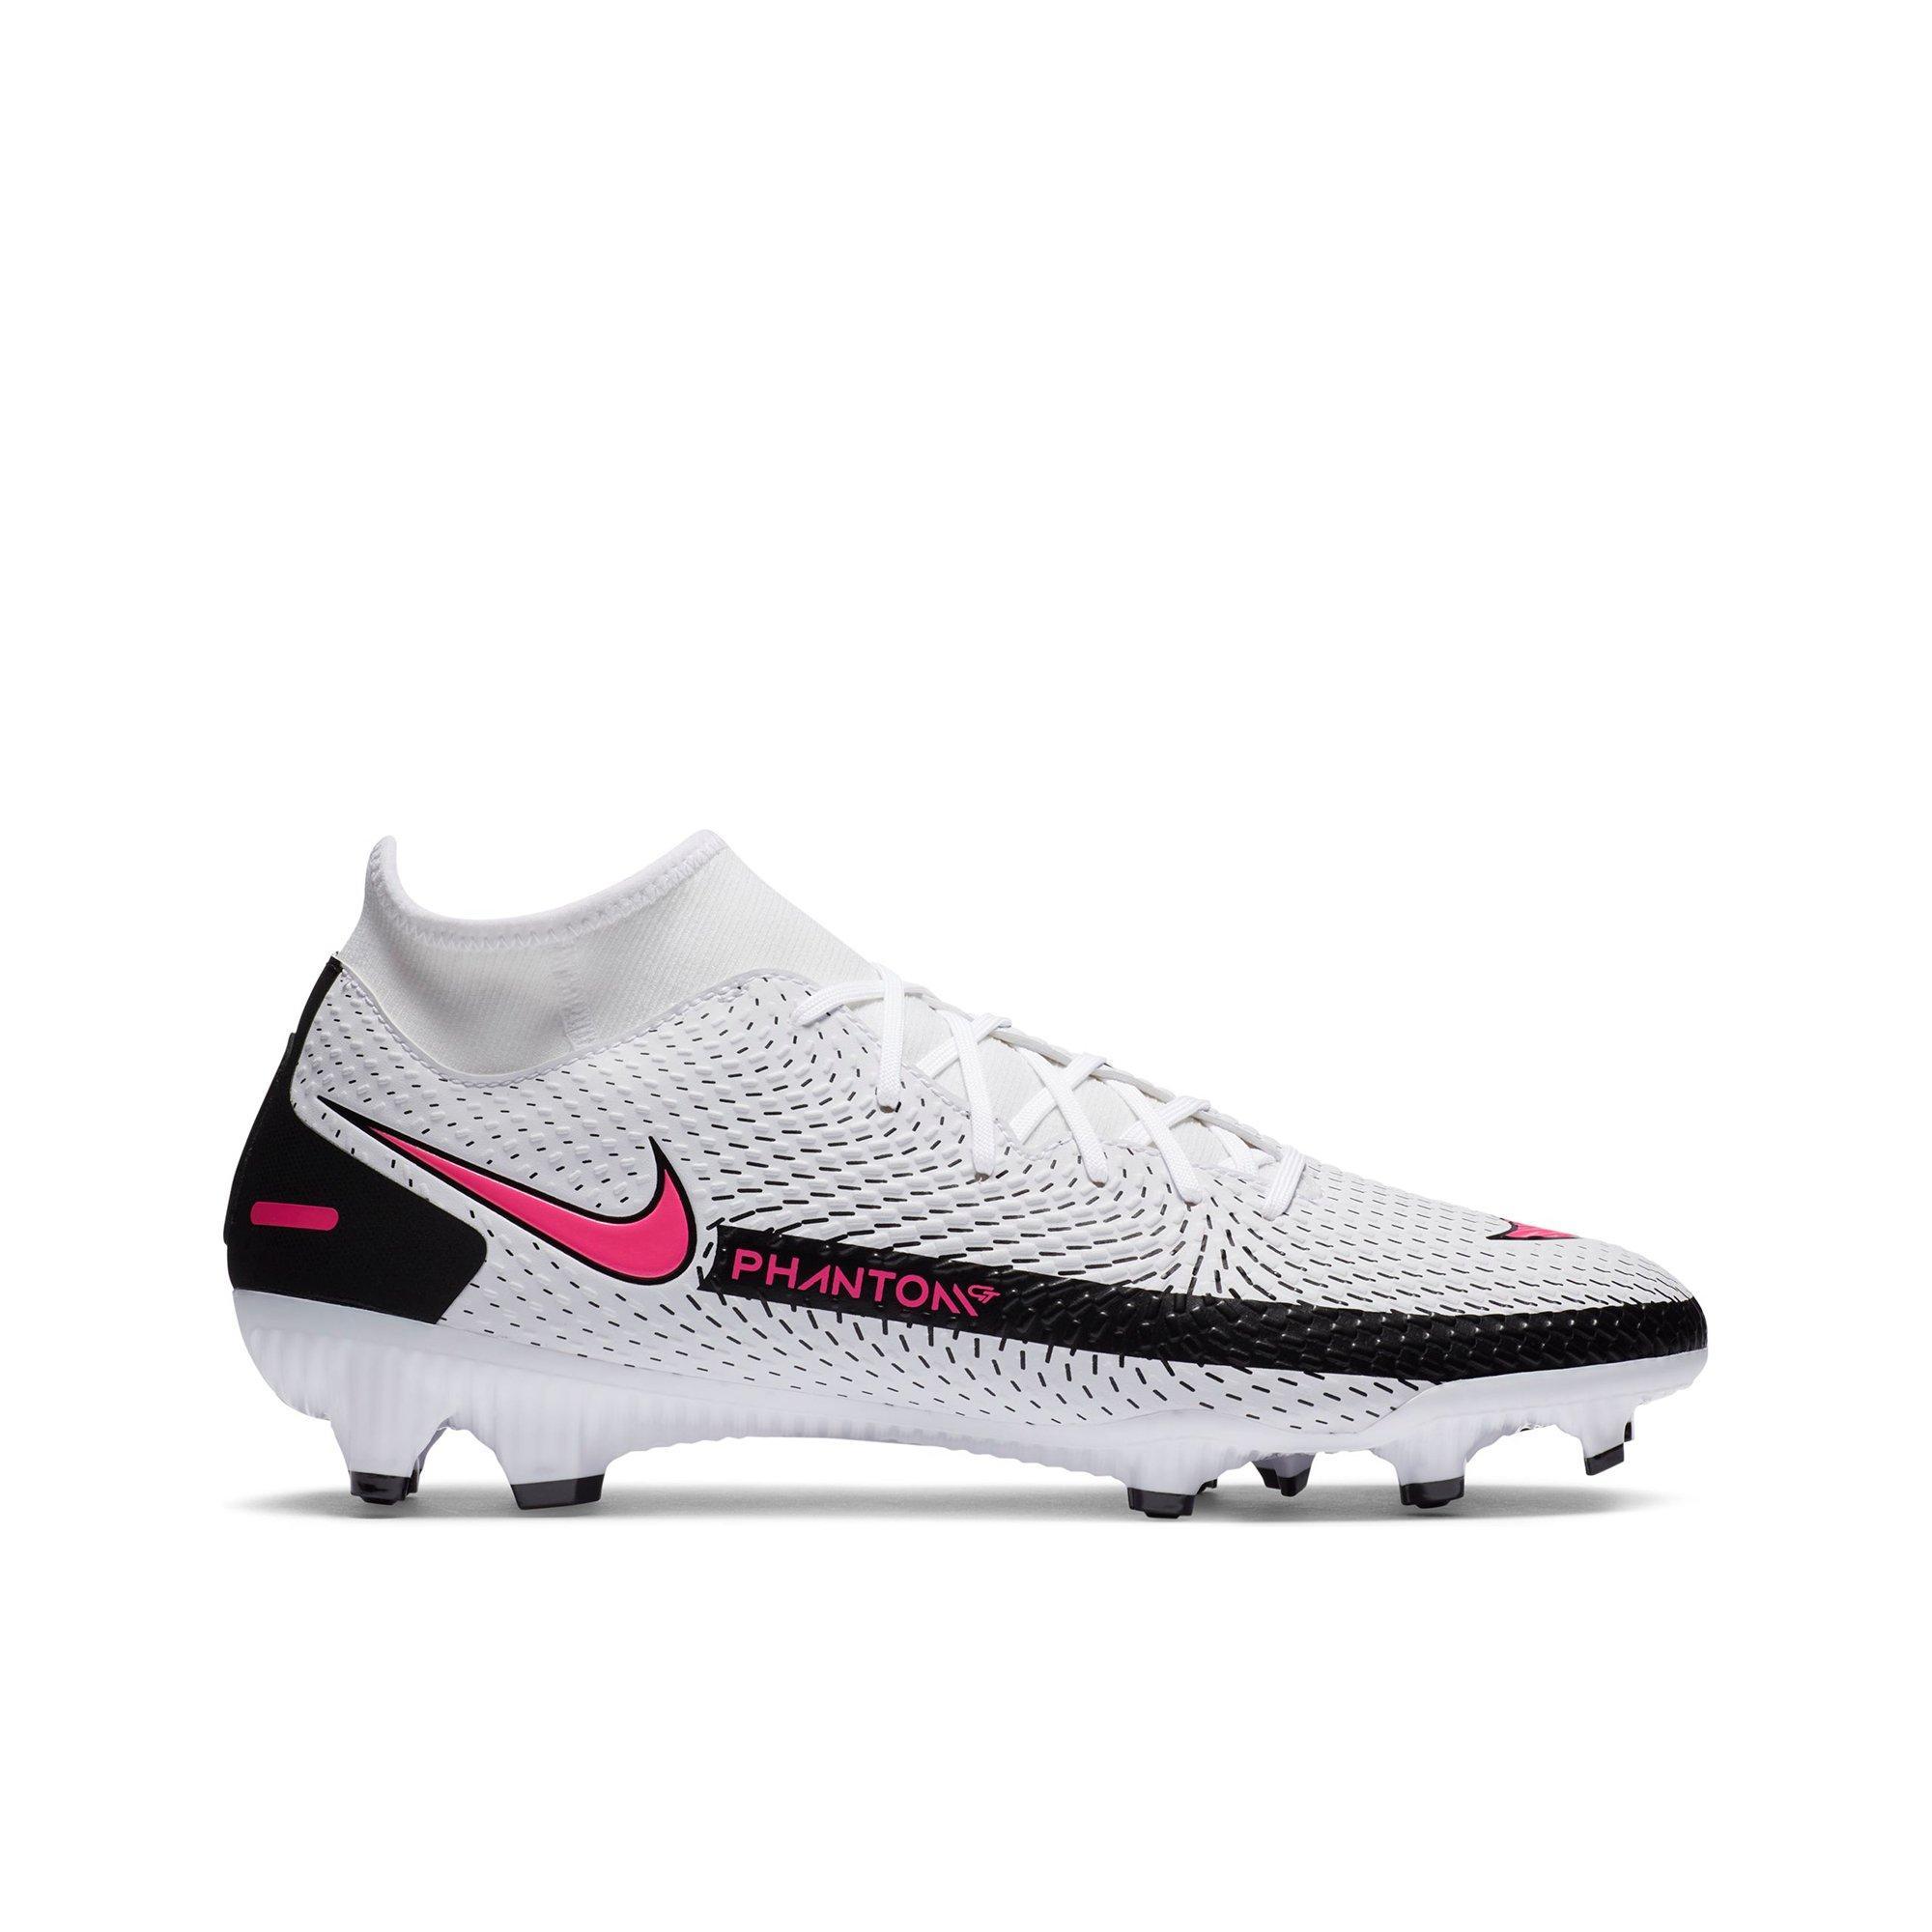 Women's Soccer Cleats | Nike, adidas